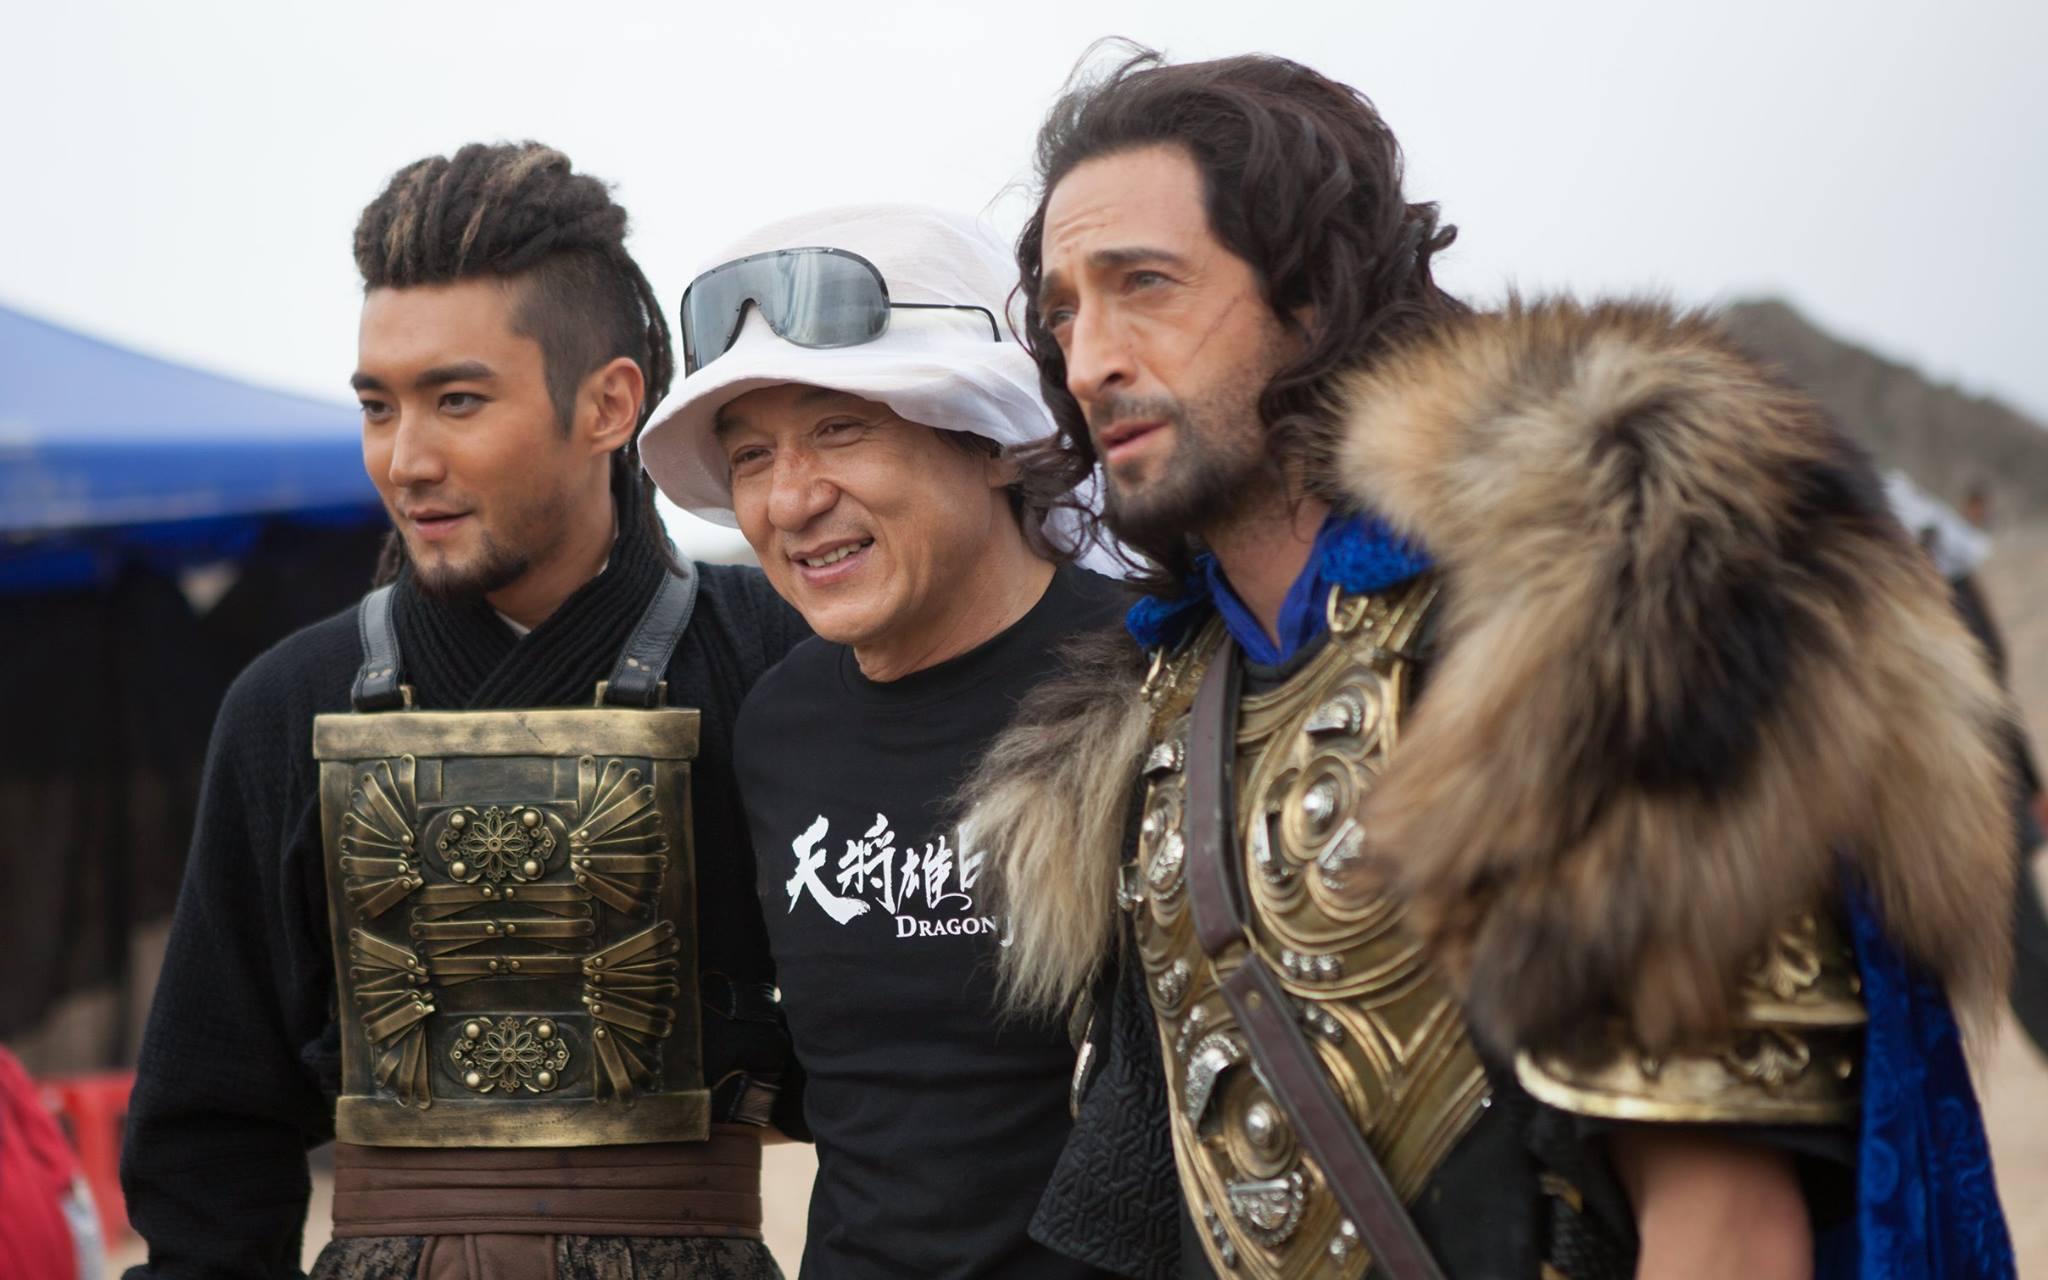 Movie review of dragon blade starring jackie chan, john cusack, adrien brody, siwon choi, mika wang, lin peng, jozef liu waite. Trailer de 'Dragon Blade' con Jackie Chan y John Cusack ...